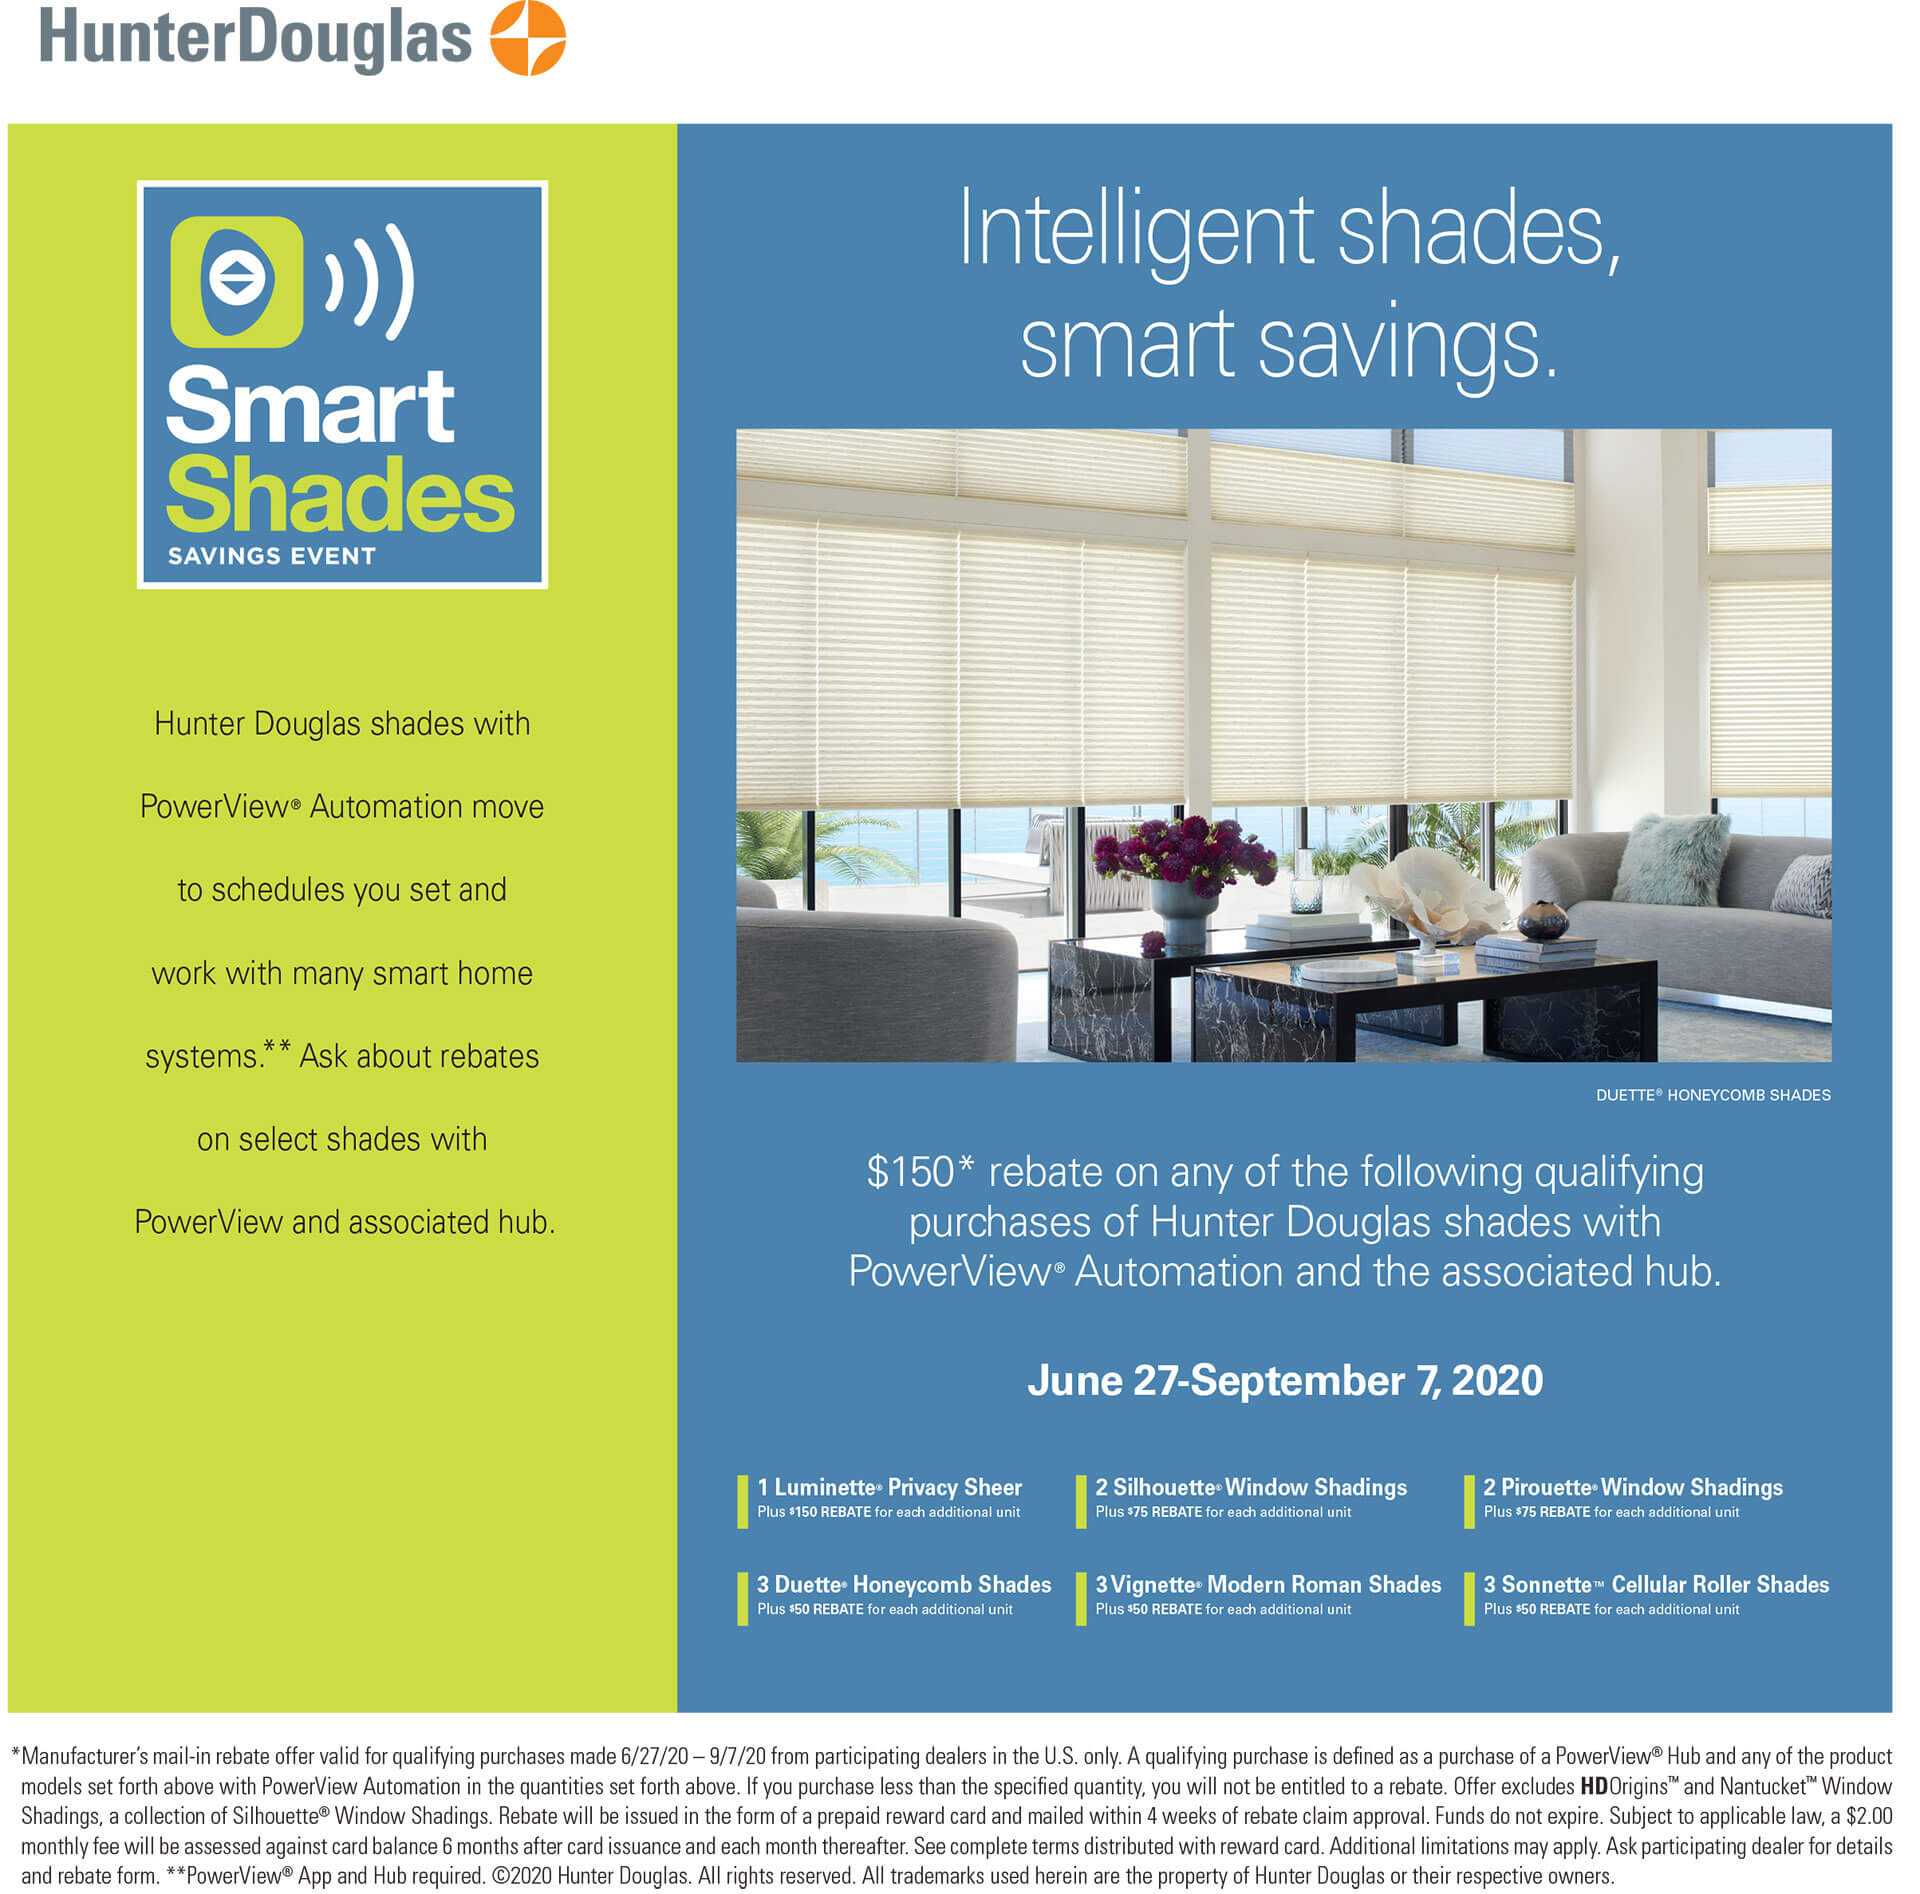 smart shades event HD